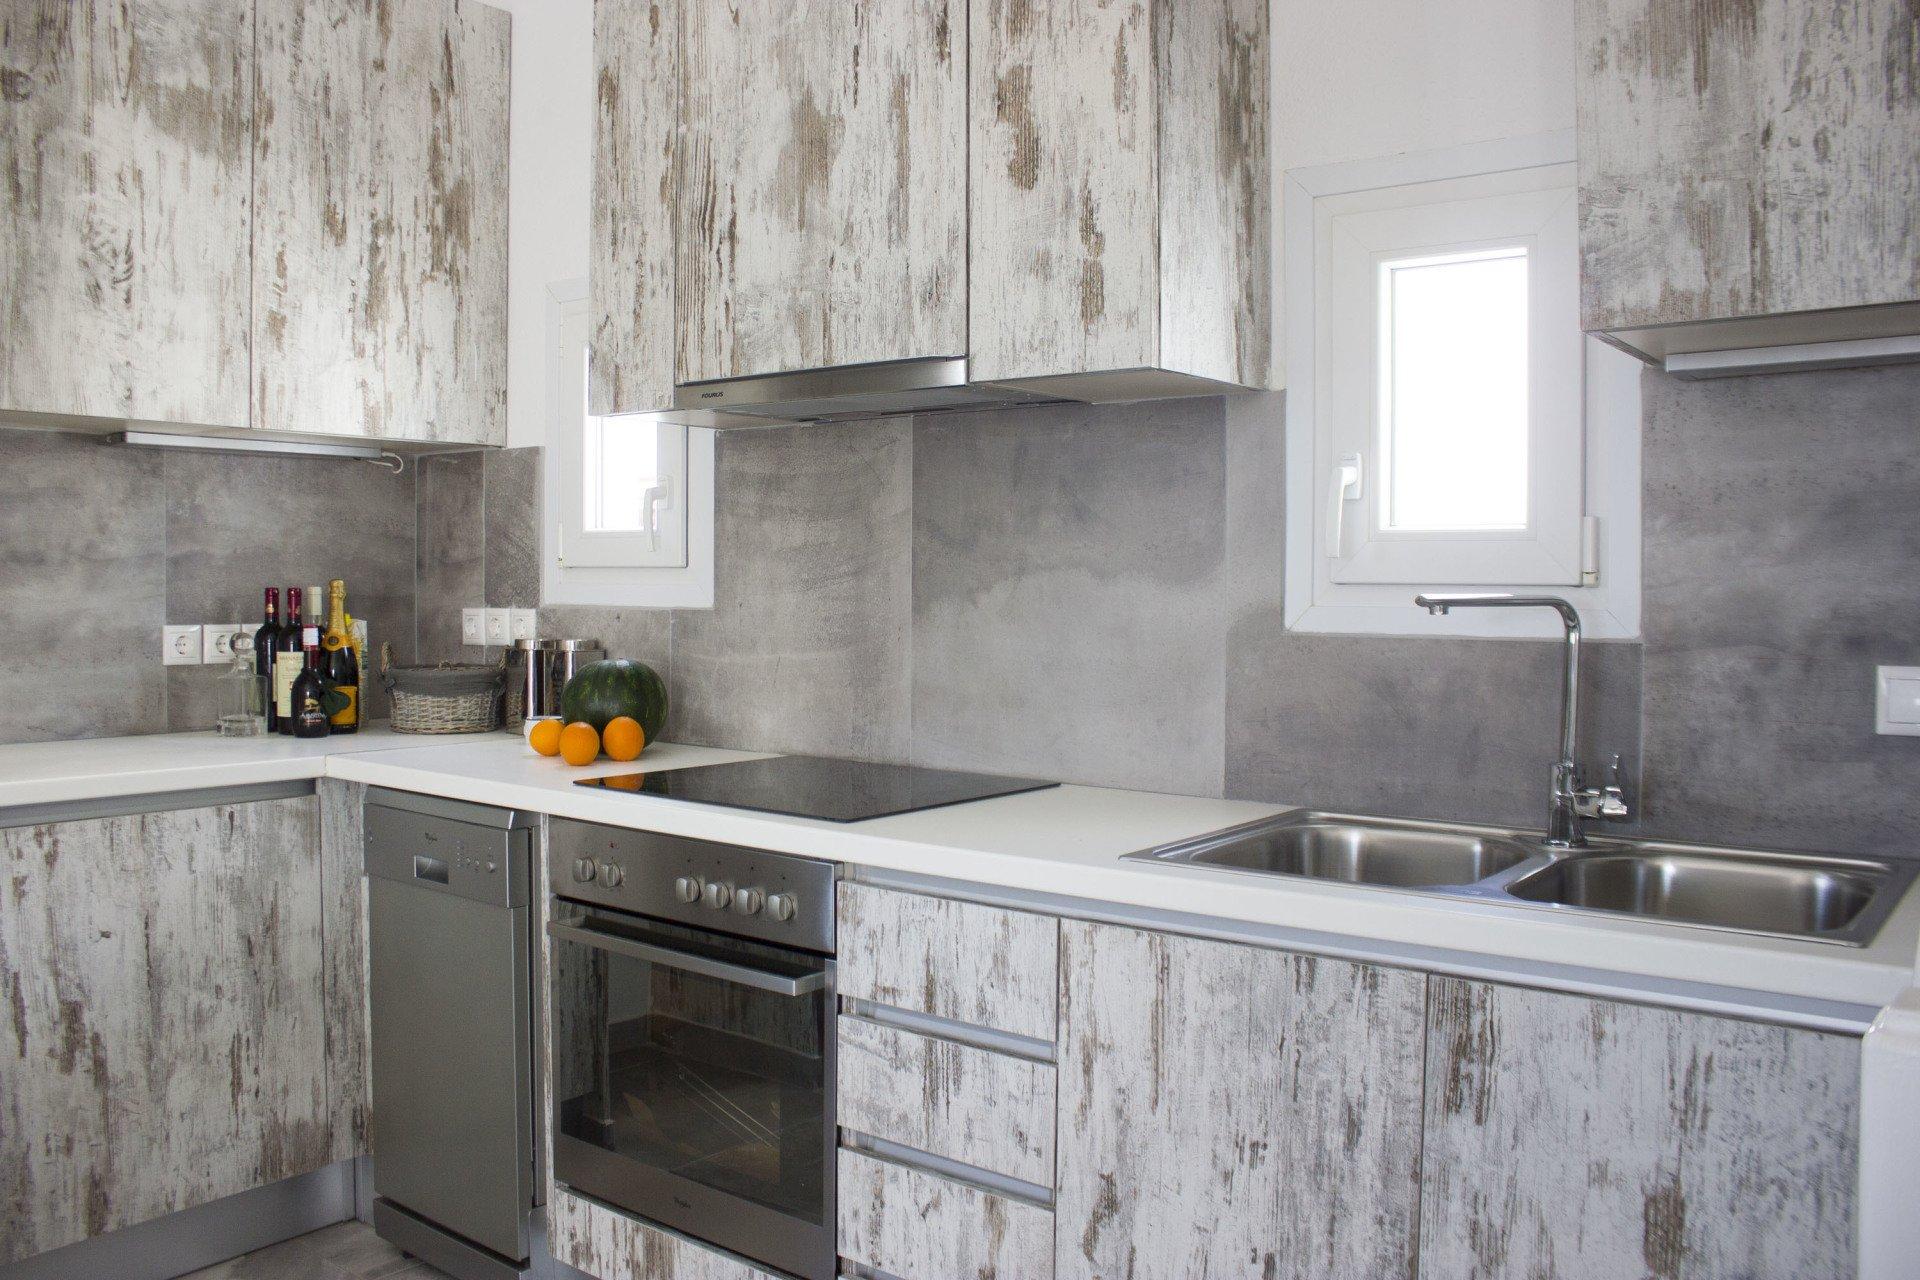 villa thallasi ornos bay kitchen